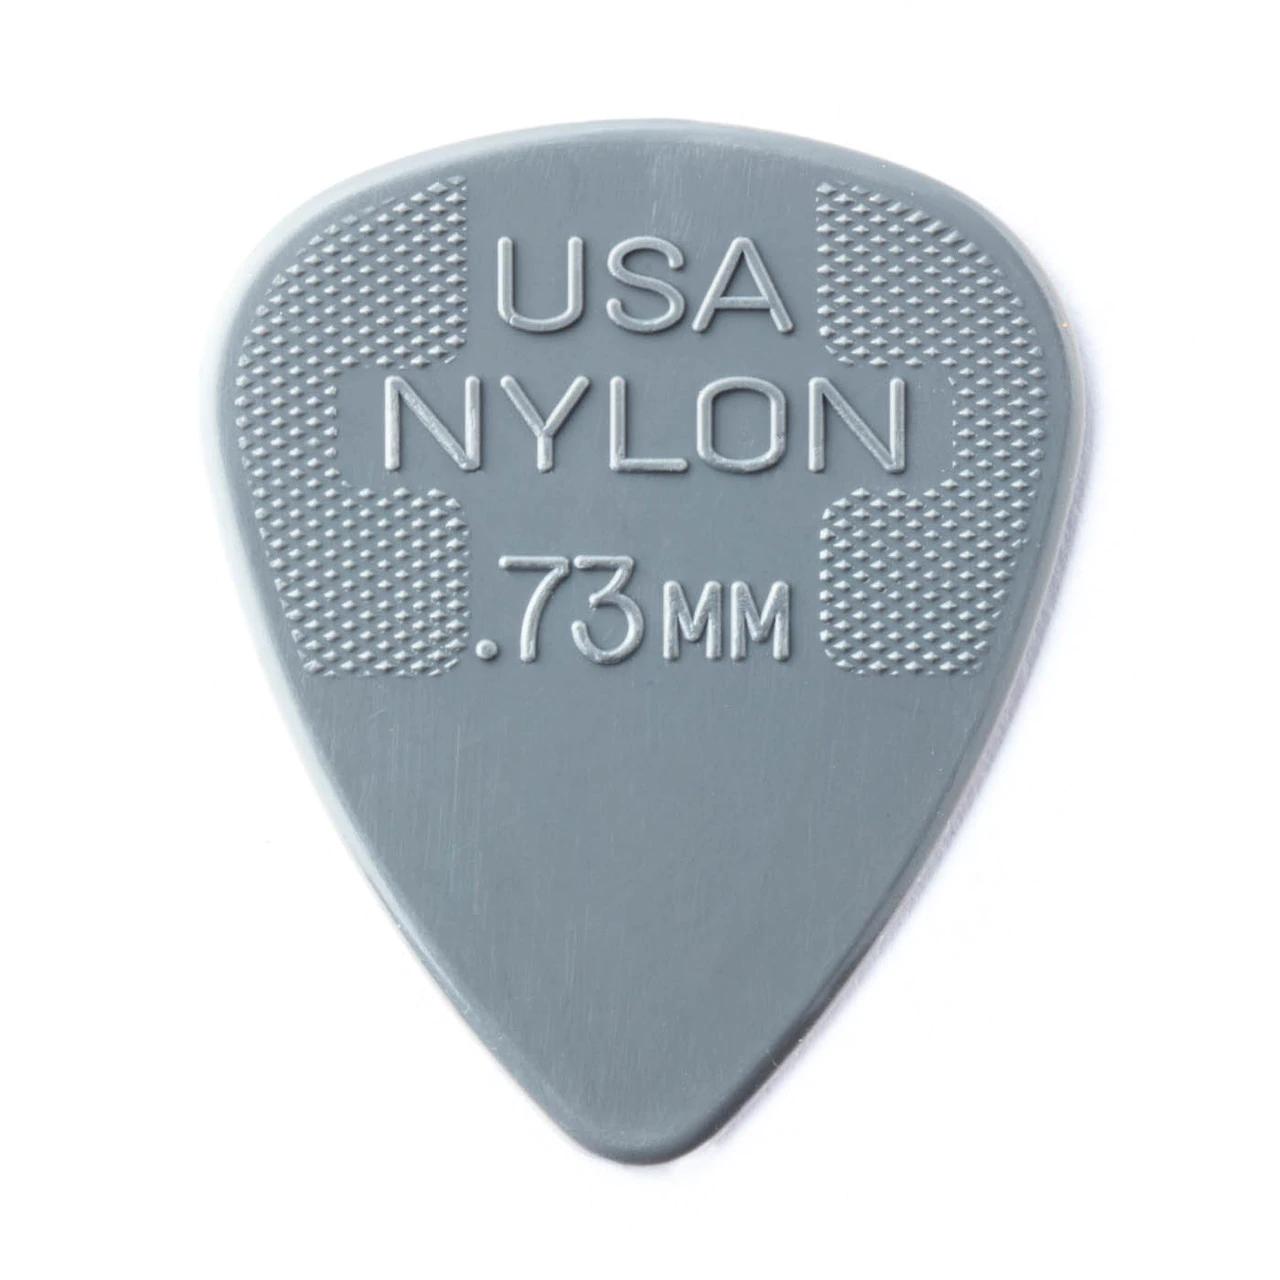 Dunlop NEW Dunlop Picks - Nylon .73mm - 12 Pack